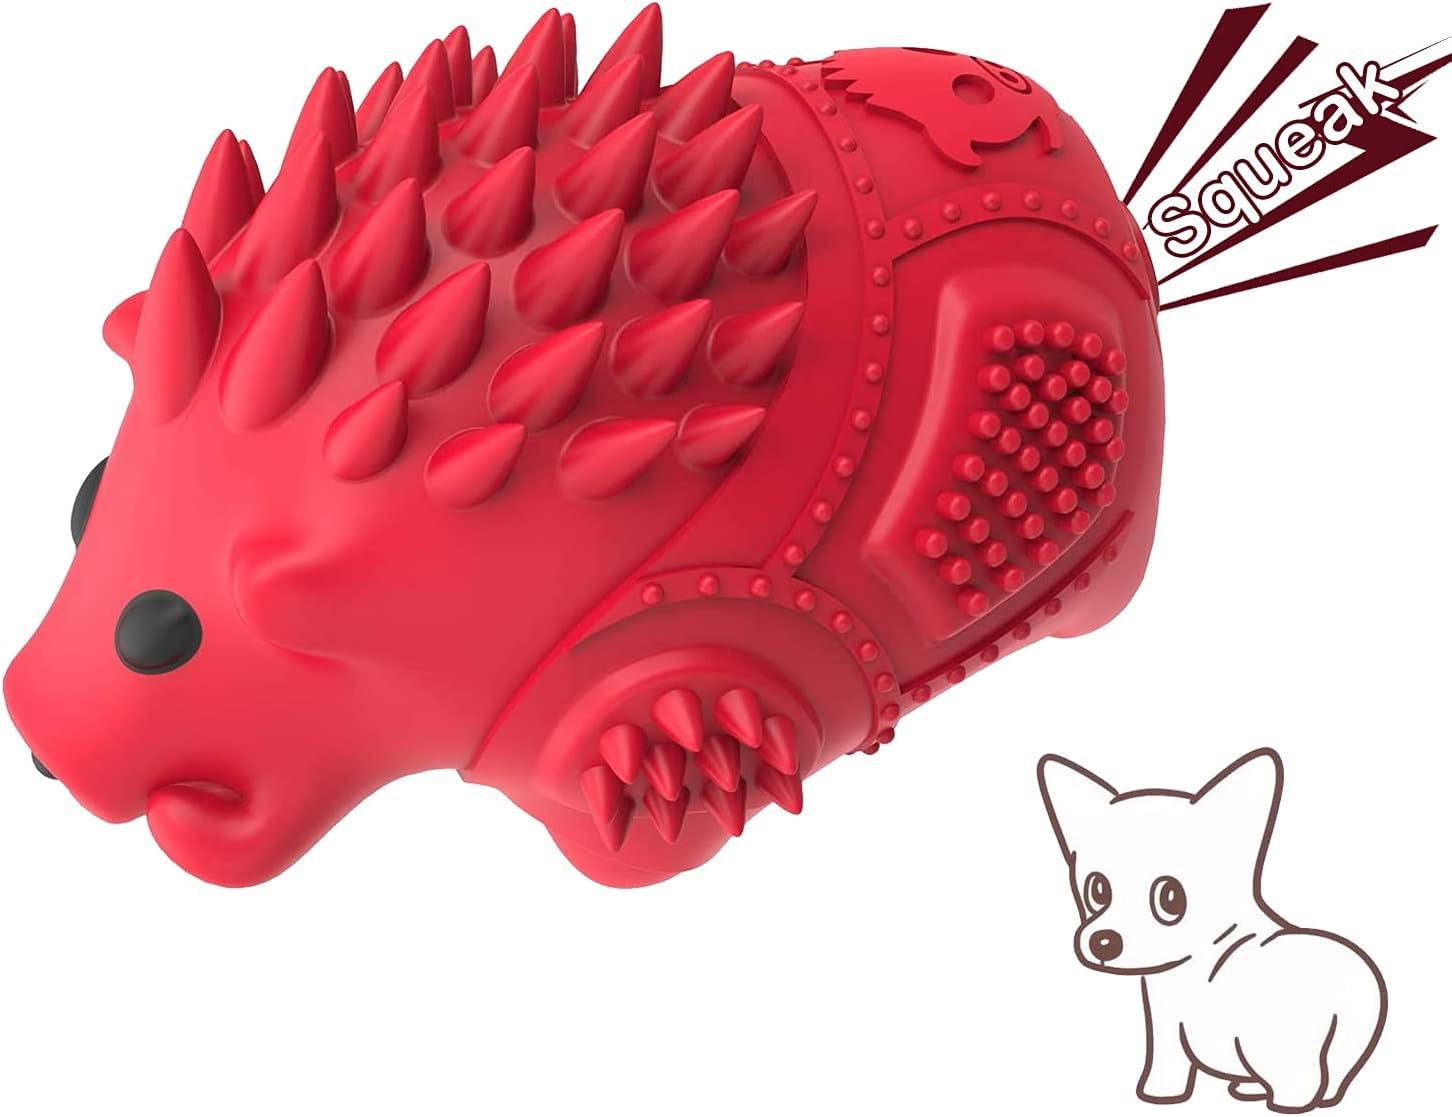 Dog Squeaky Toys – 互动耐用狗狗咀嚼玩具,含牛奶味,天然橡胶和清洁牙齿,适用于 20-70 个 Ib 狗狗强力咀嚼器